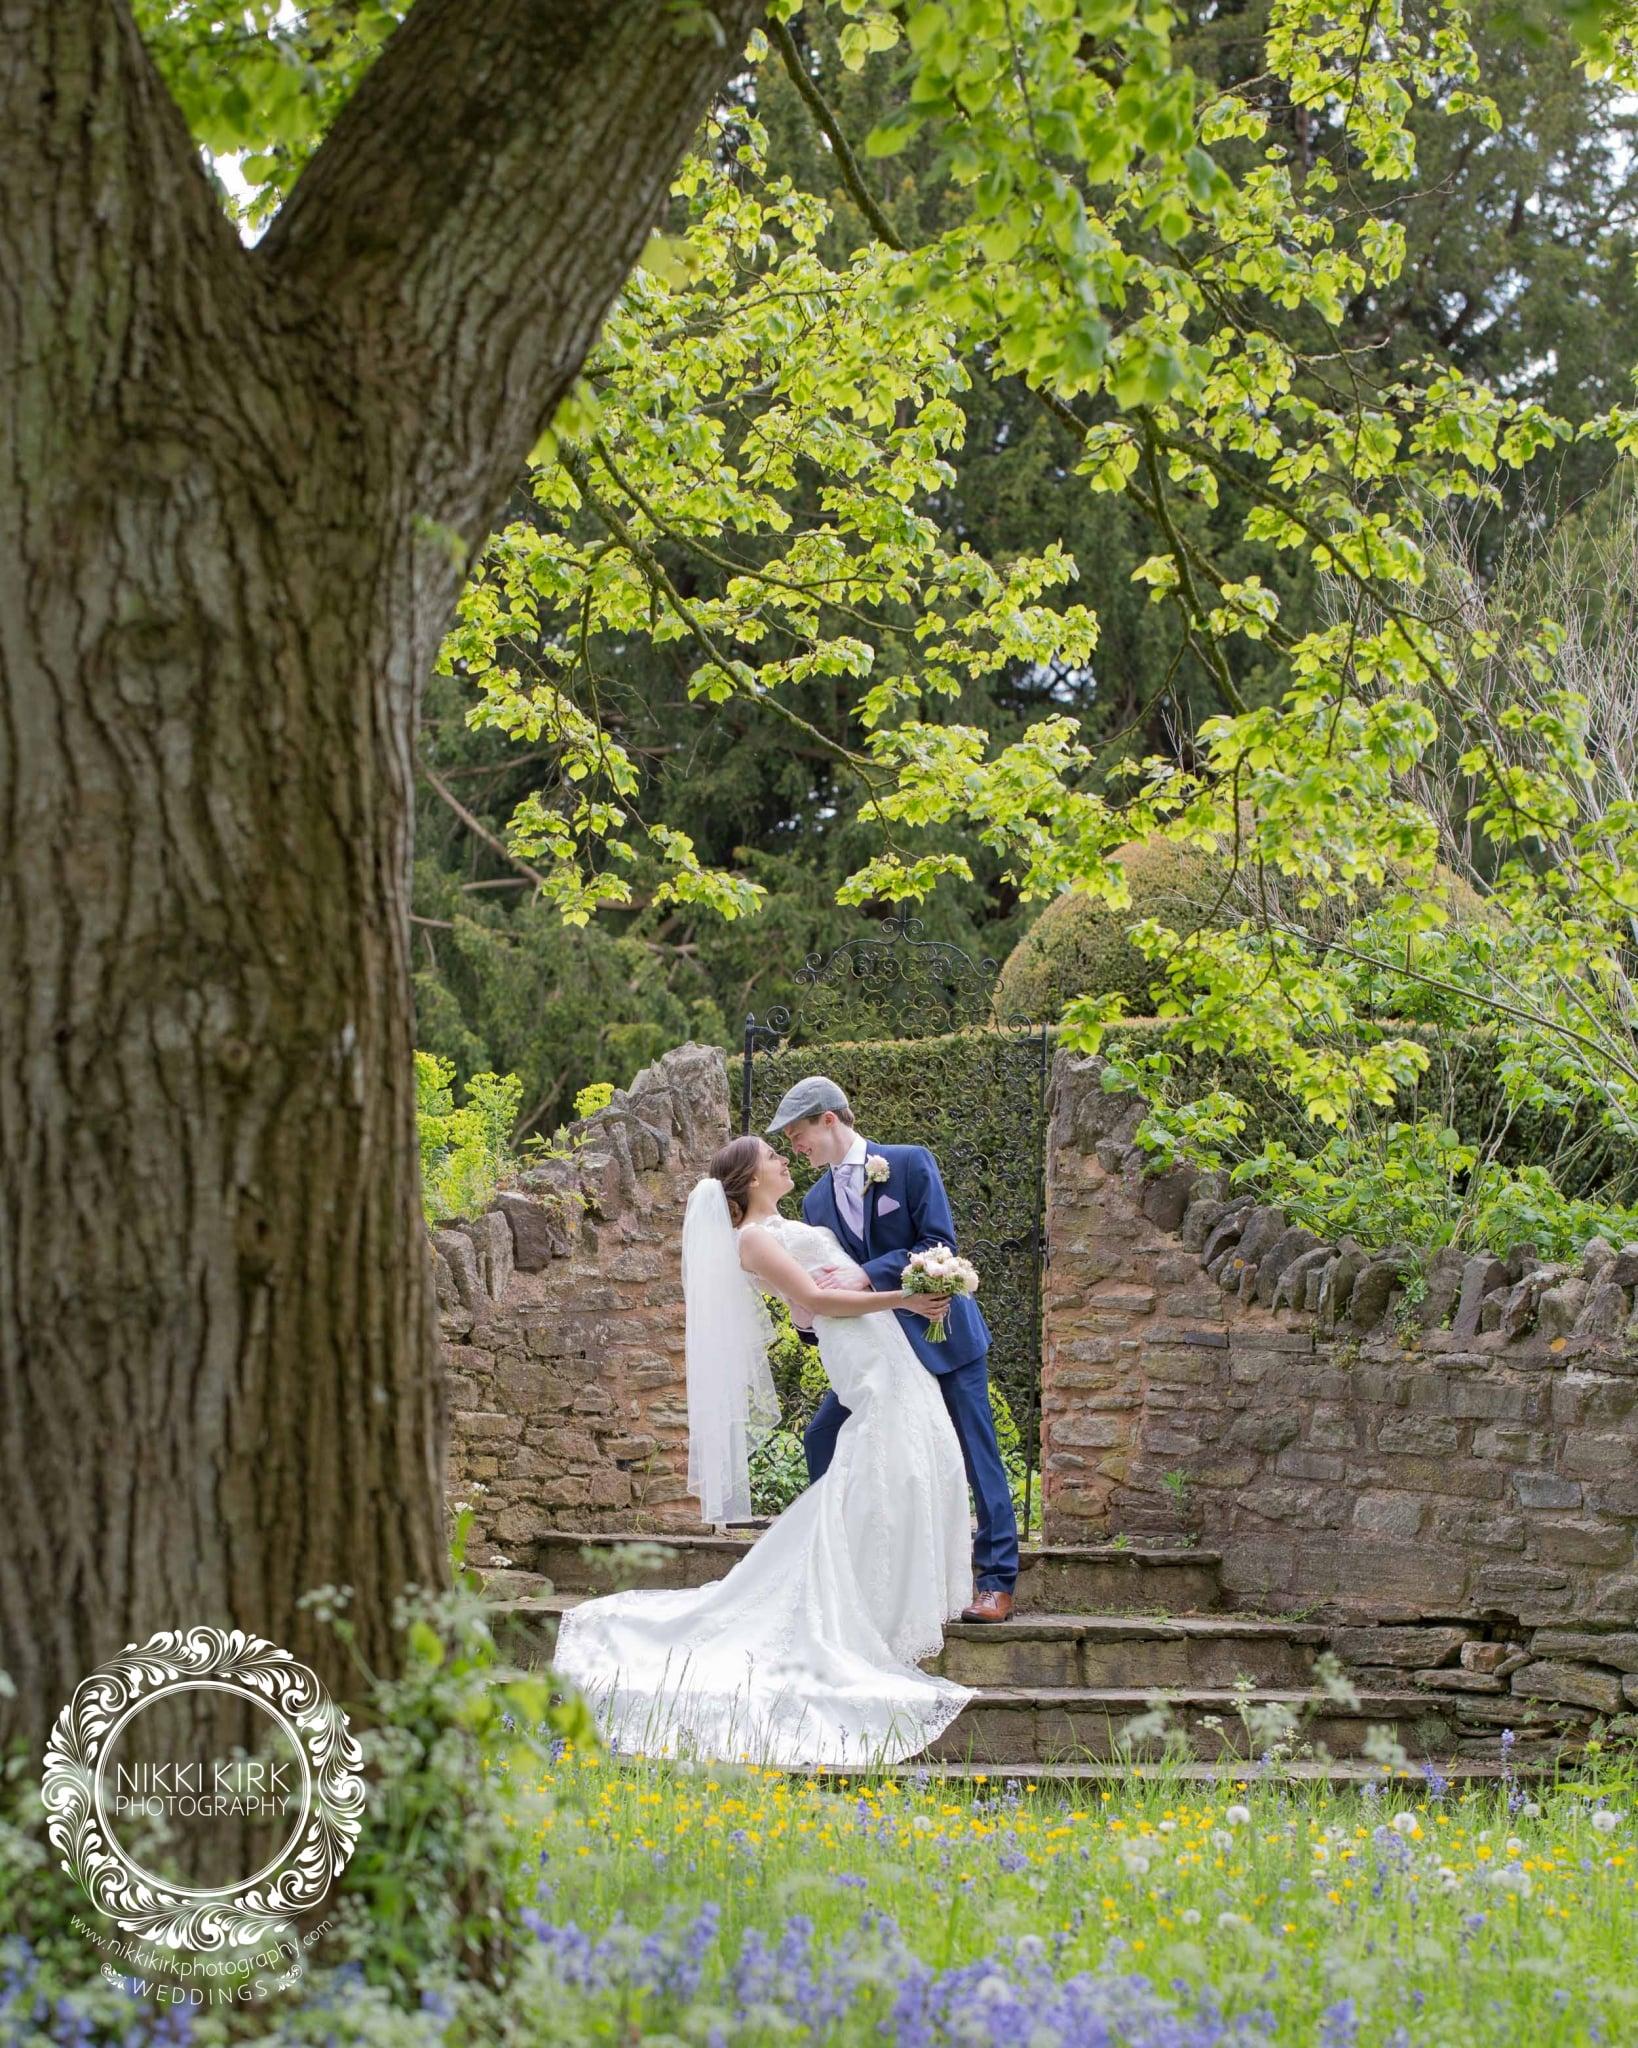 Birtsmorton Court Wedding photographer Nikki Kirk Photography